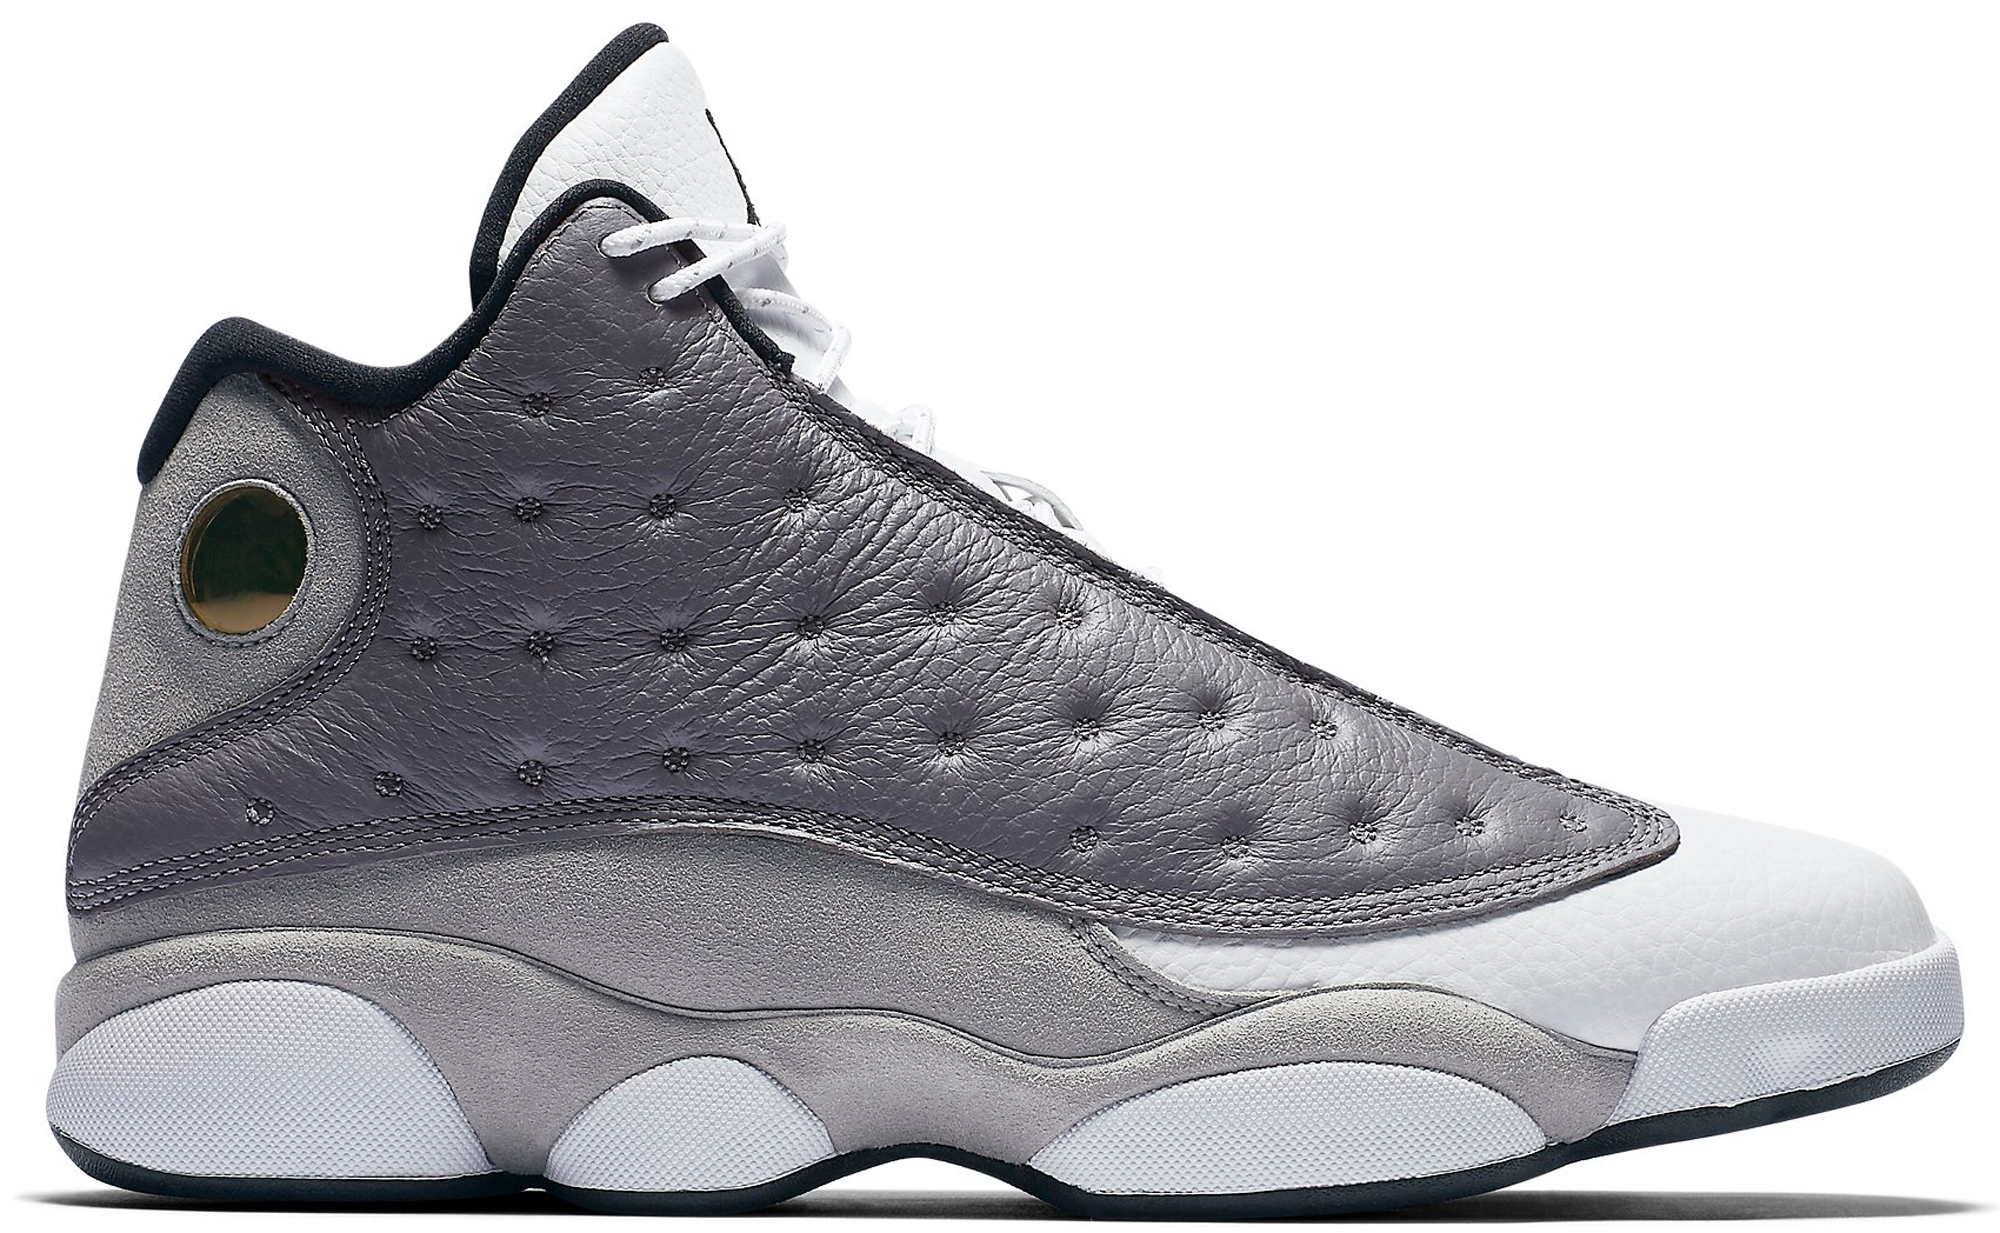 Jordan 13 Retro Atmosphere Grey